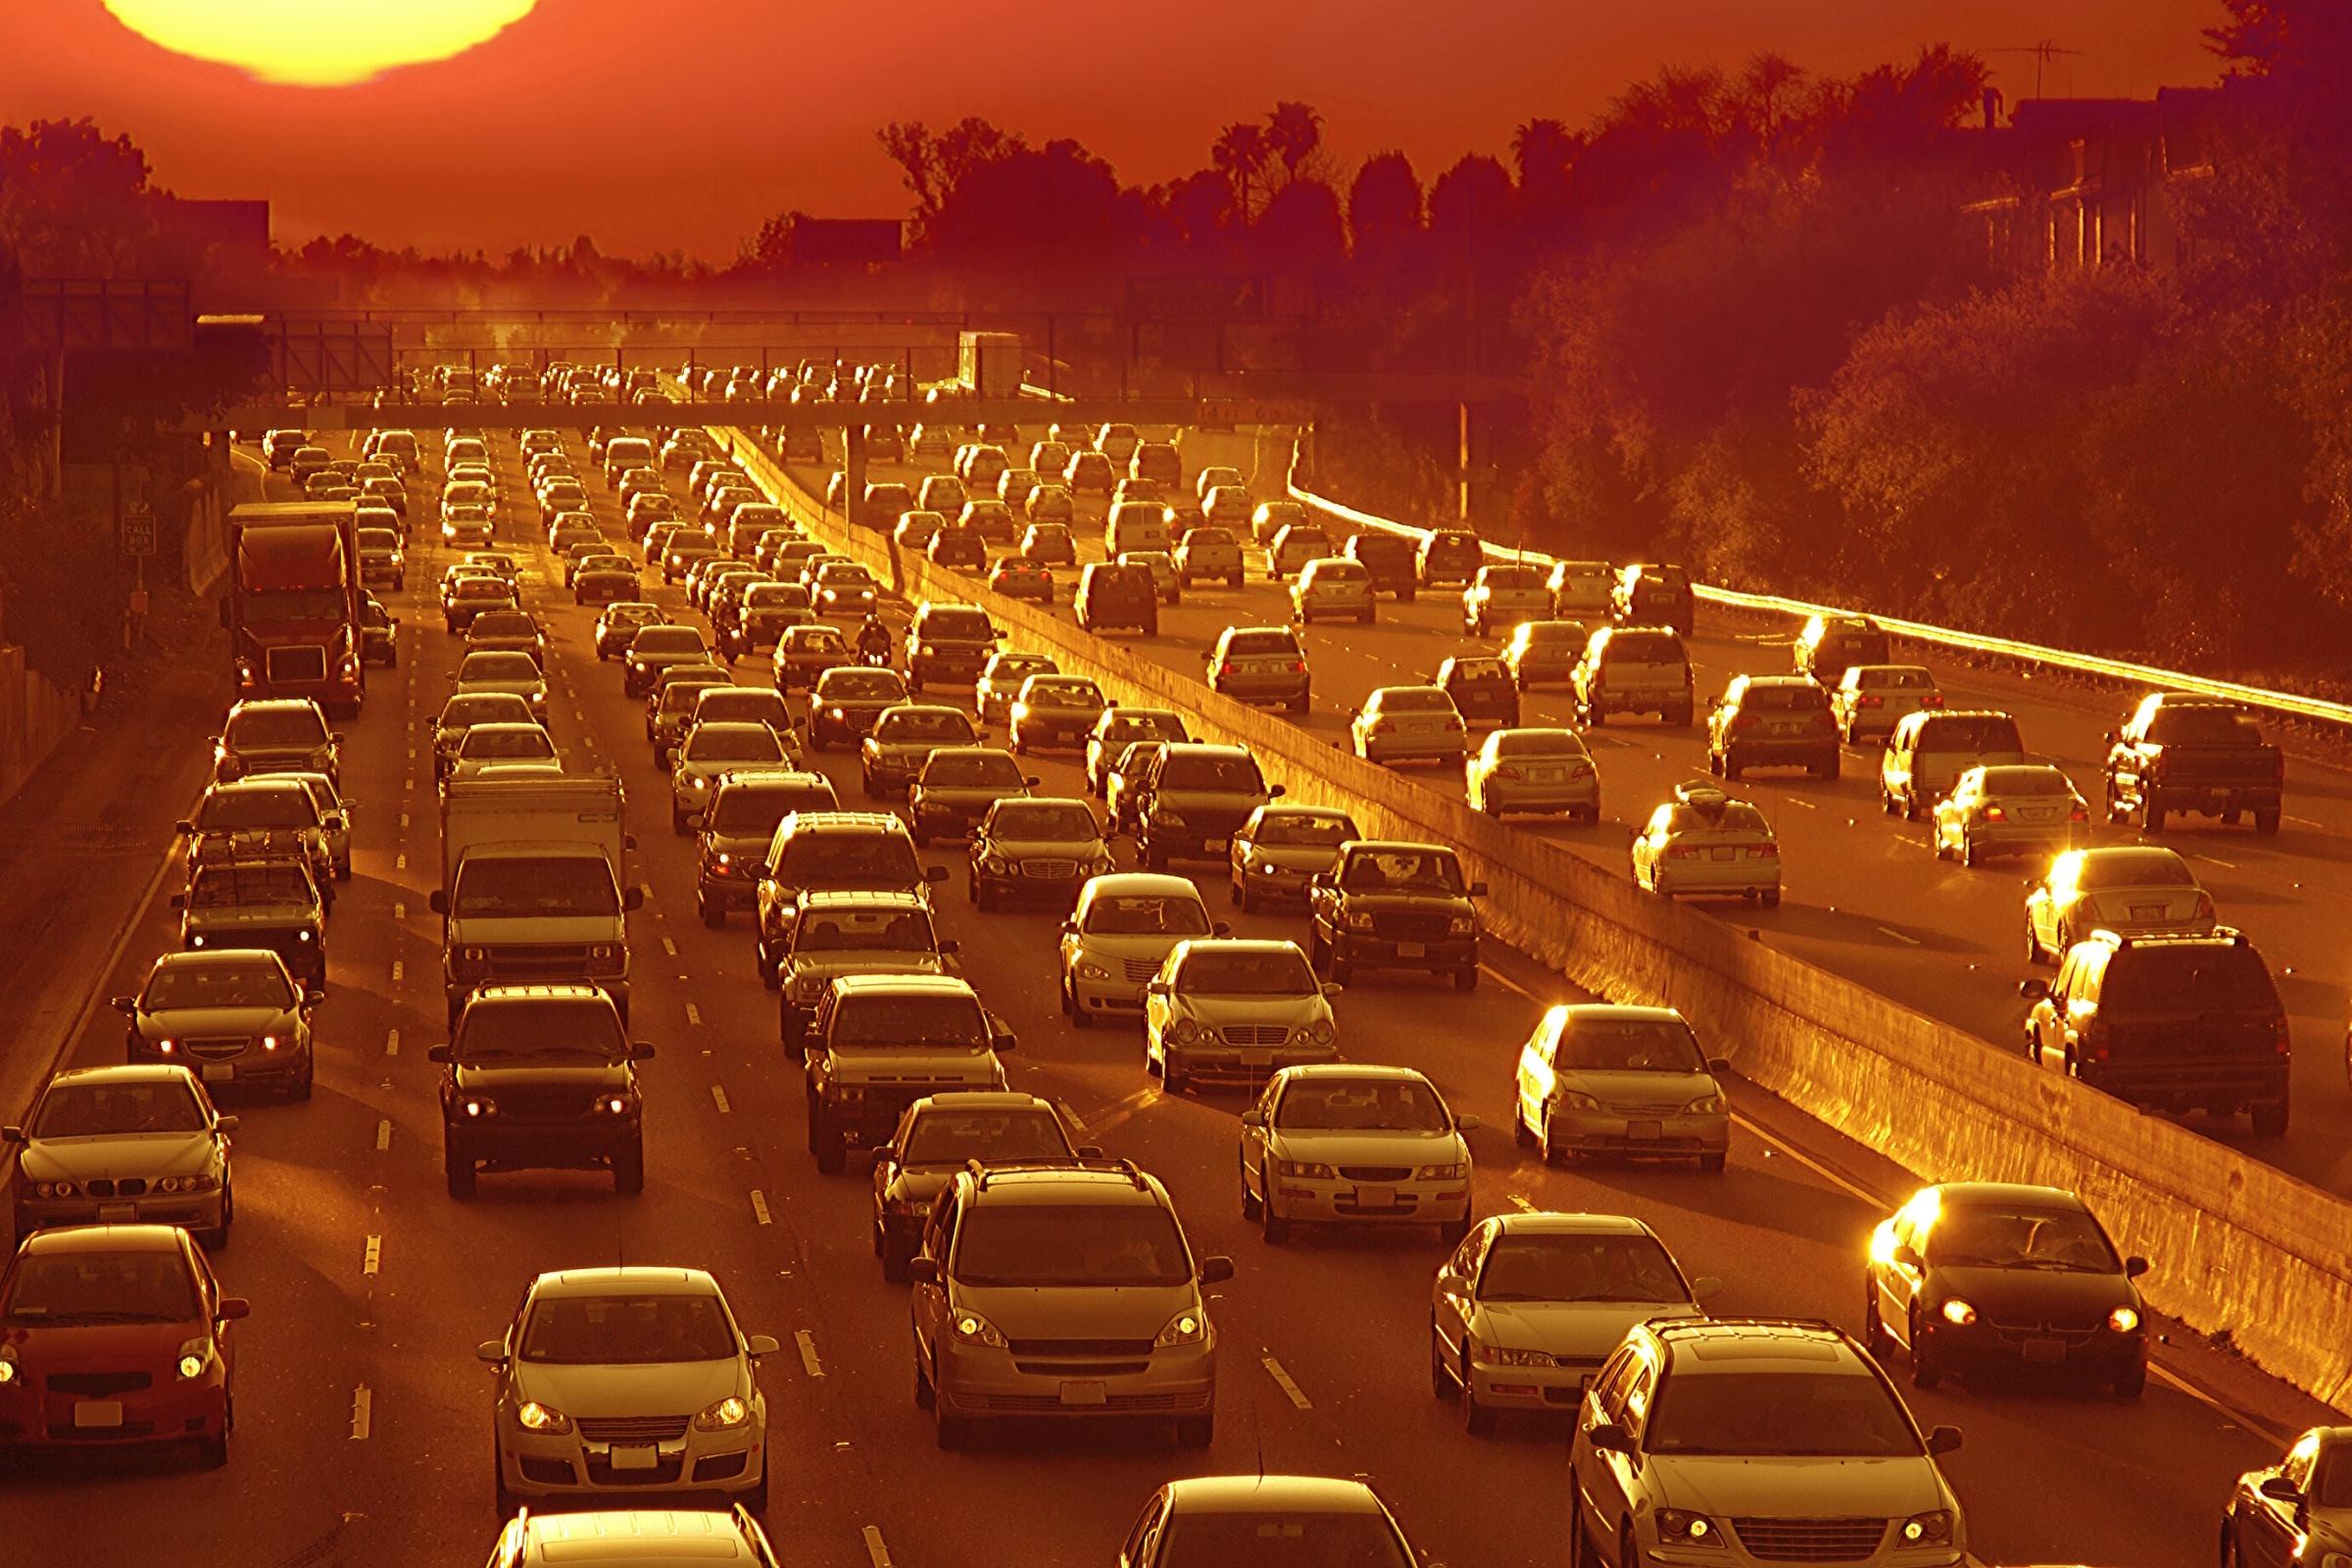 Location Limtation Traffic Jam-Night Time